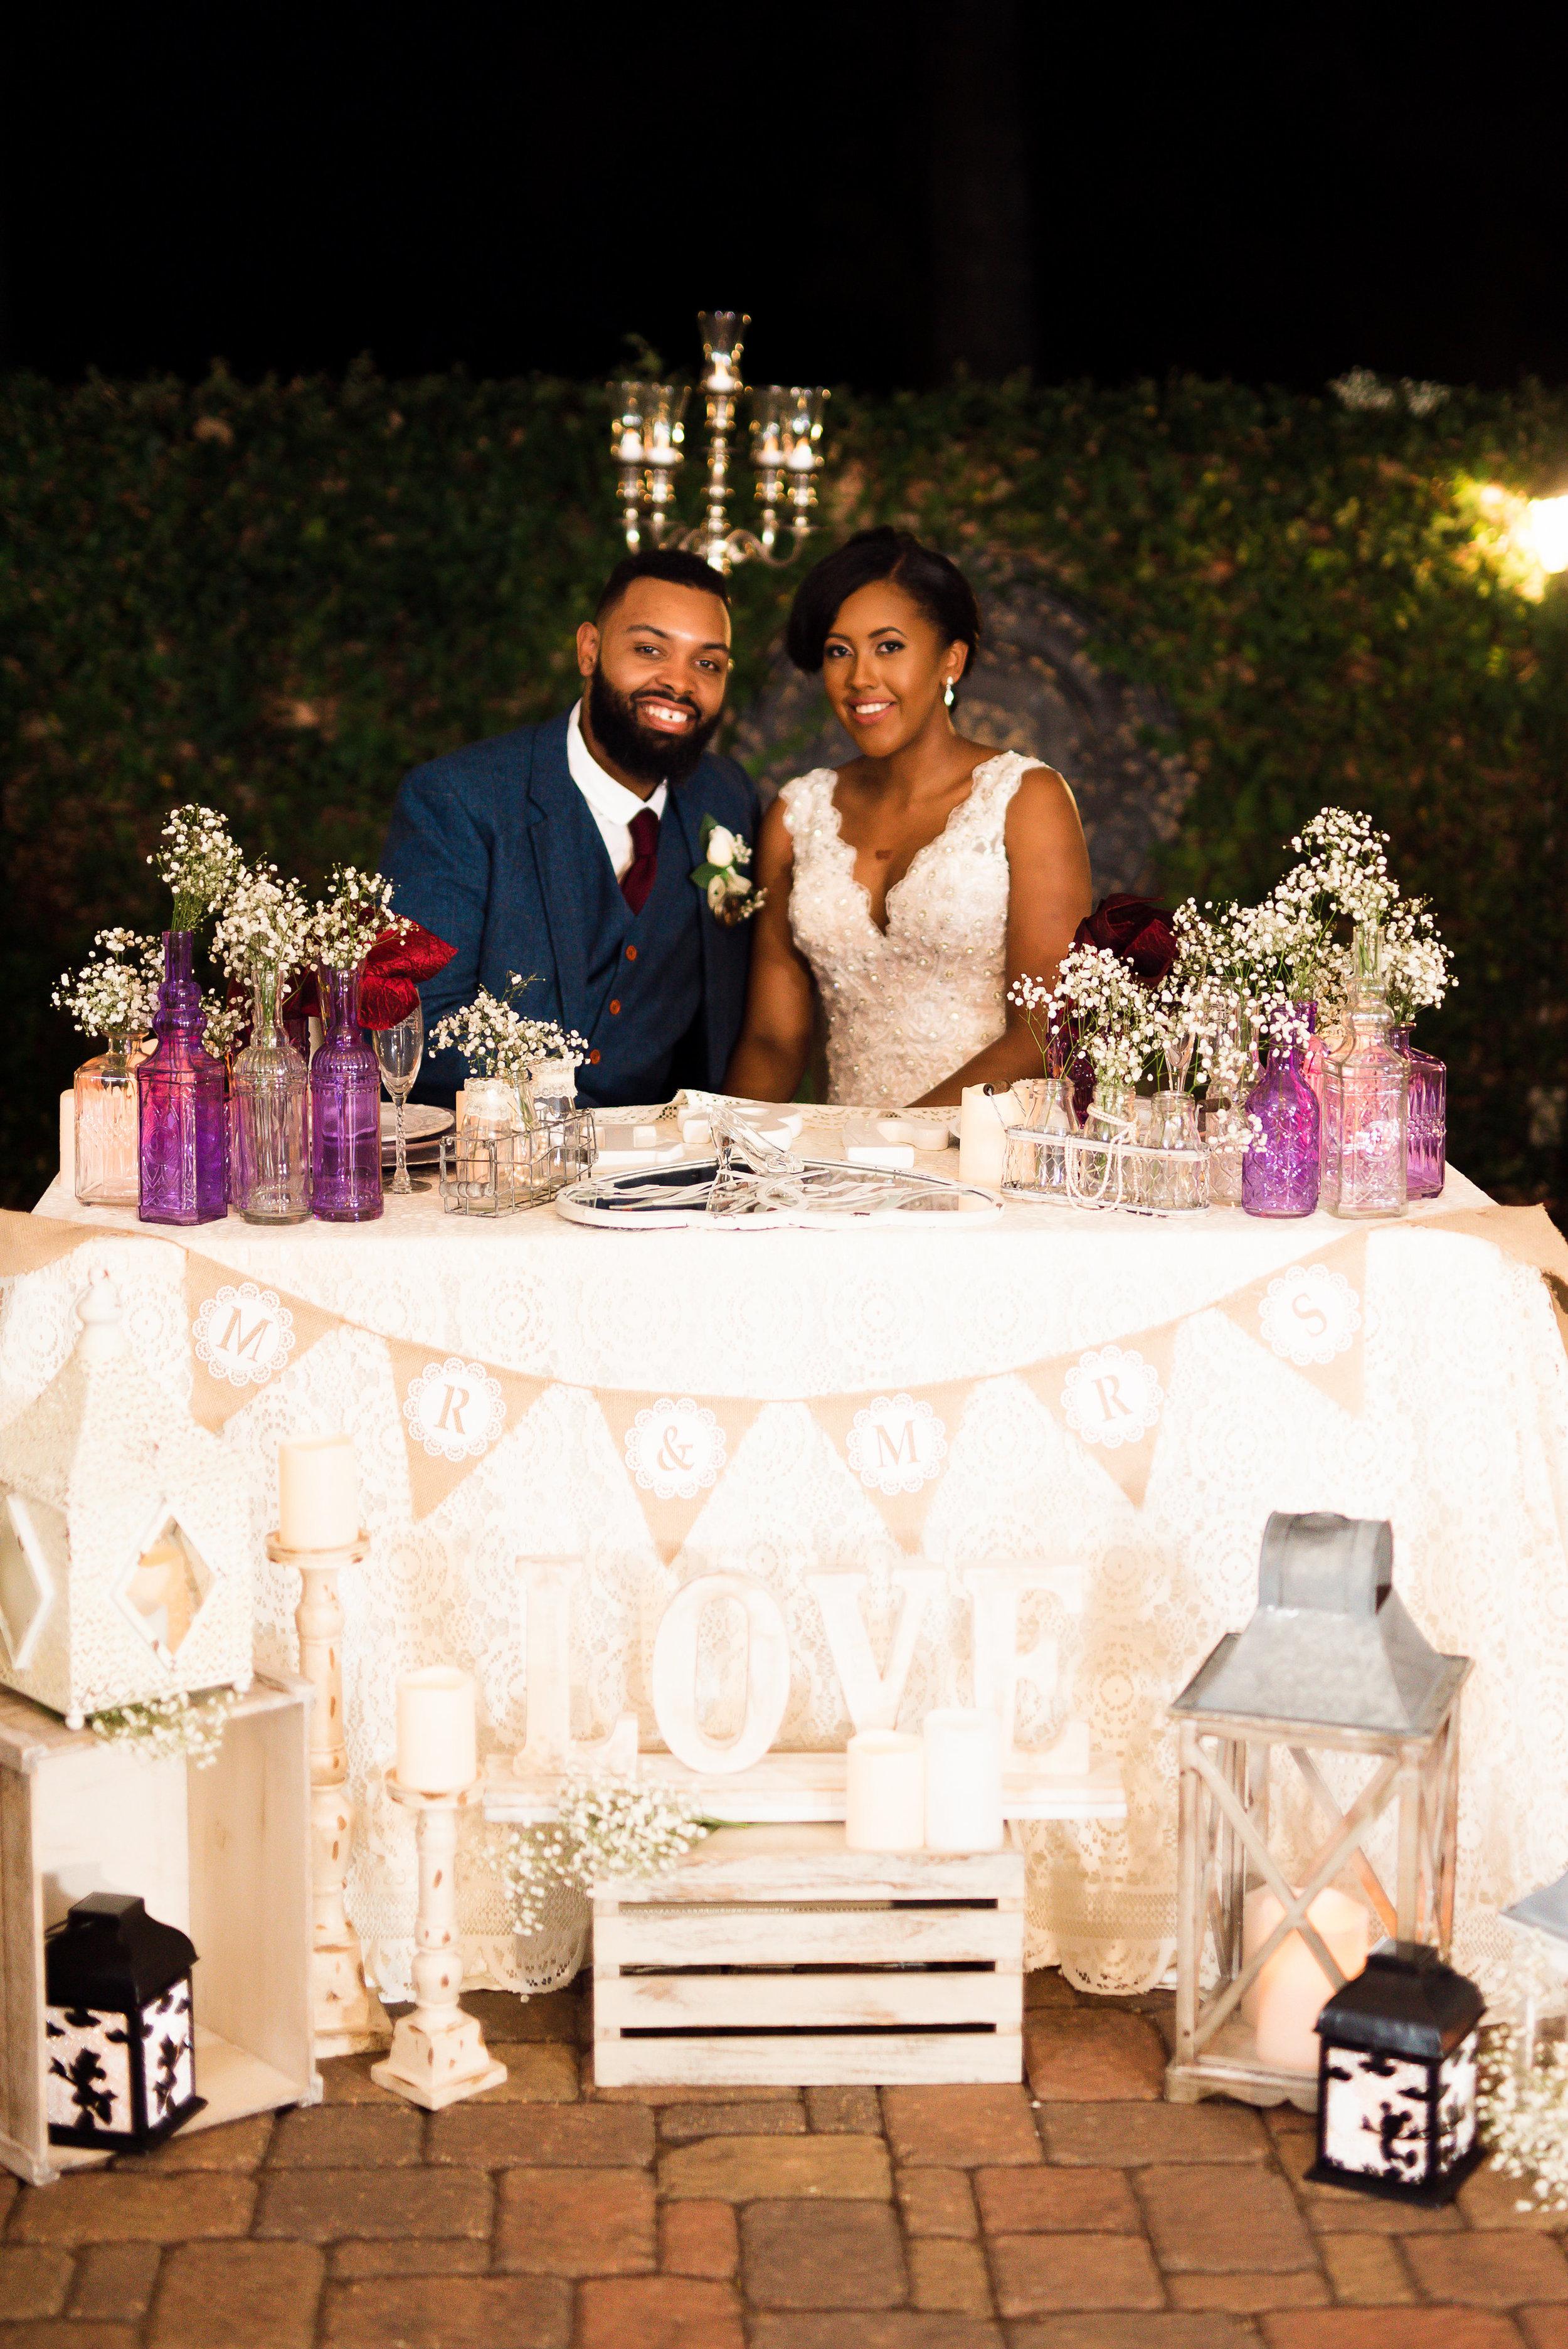 TC-Jessica-Garr-Pharris-Photography-Real-Wedding-40.jpg